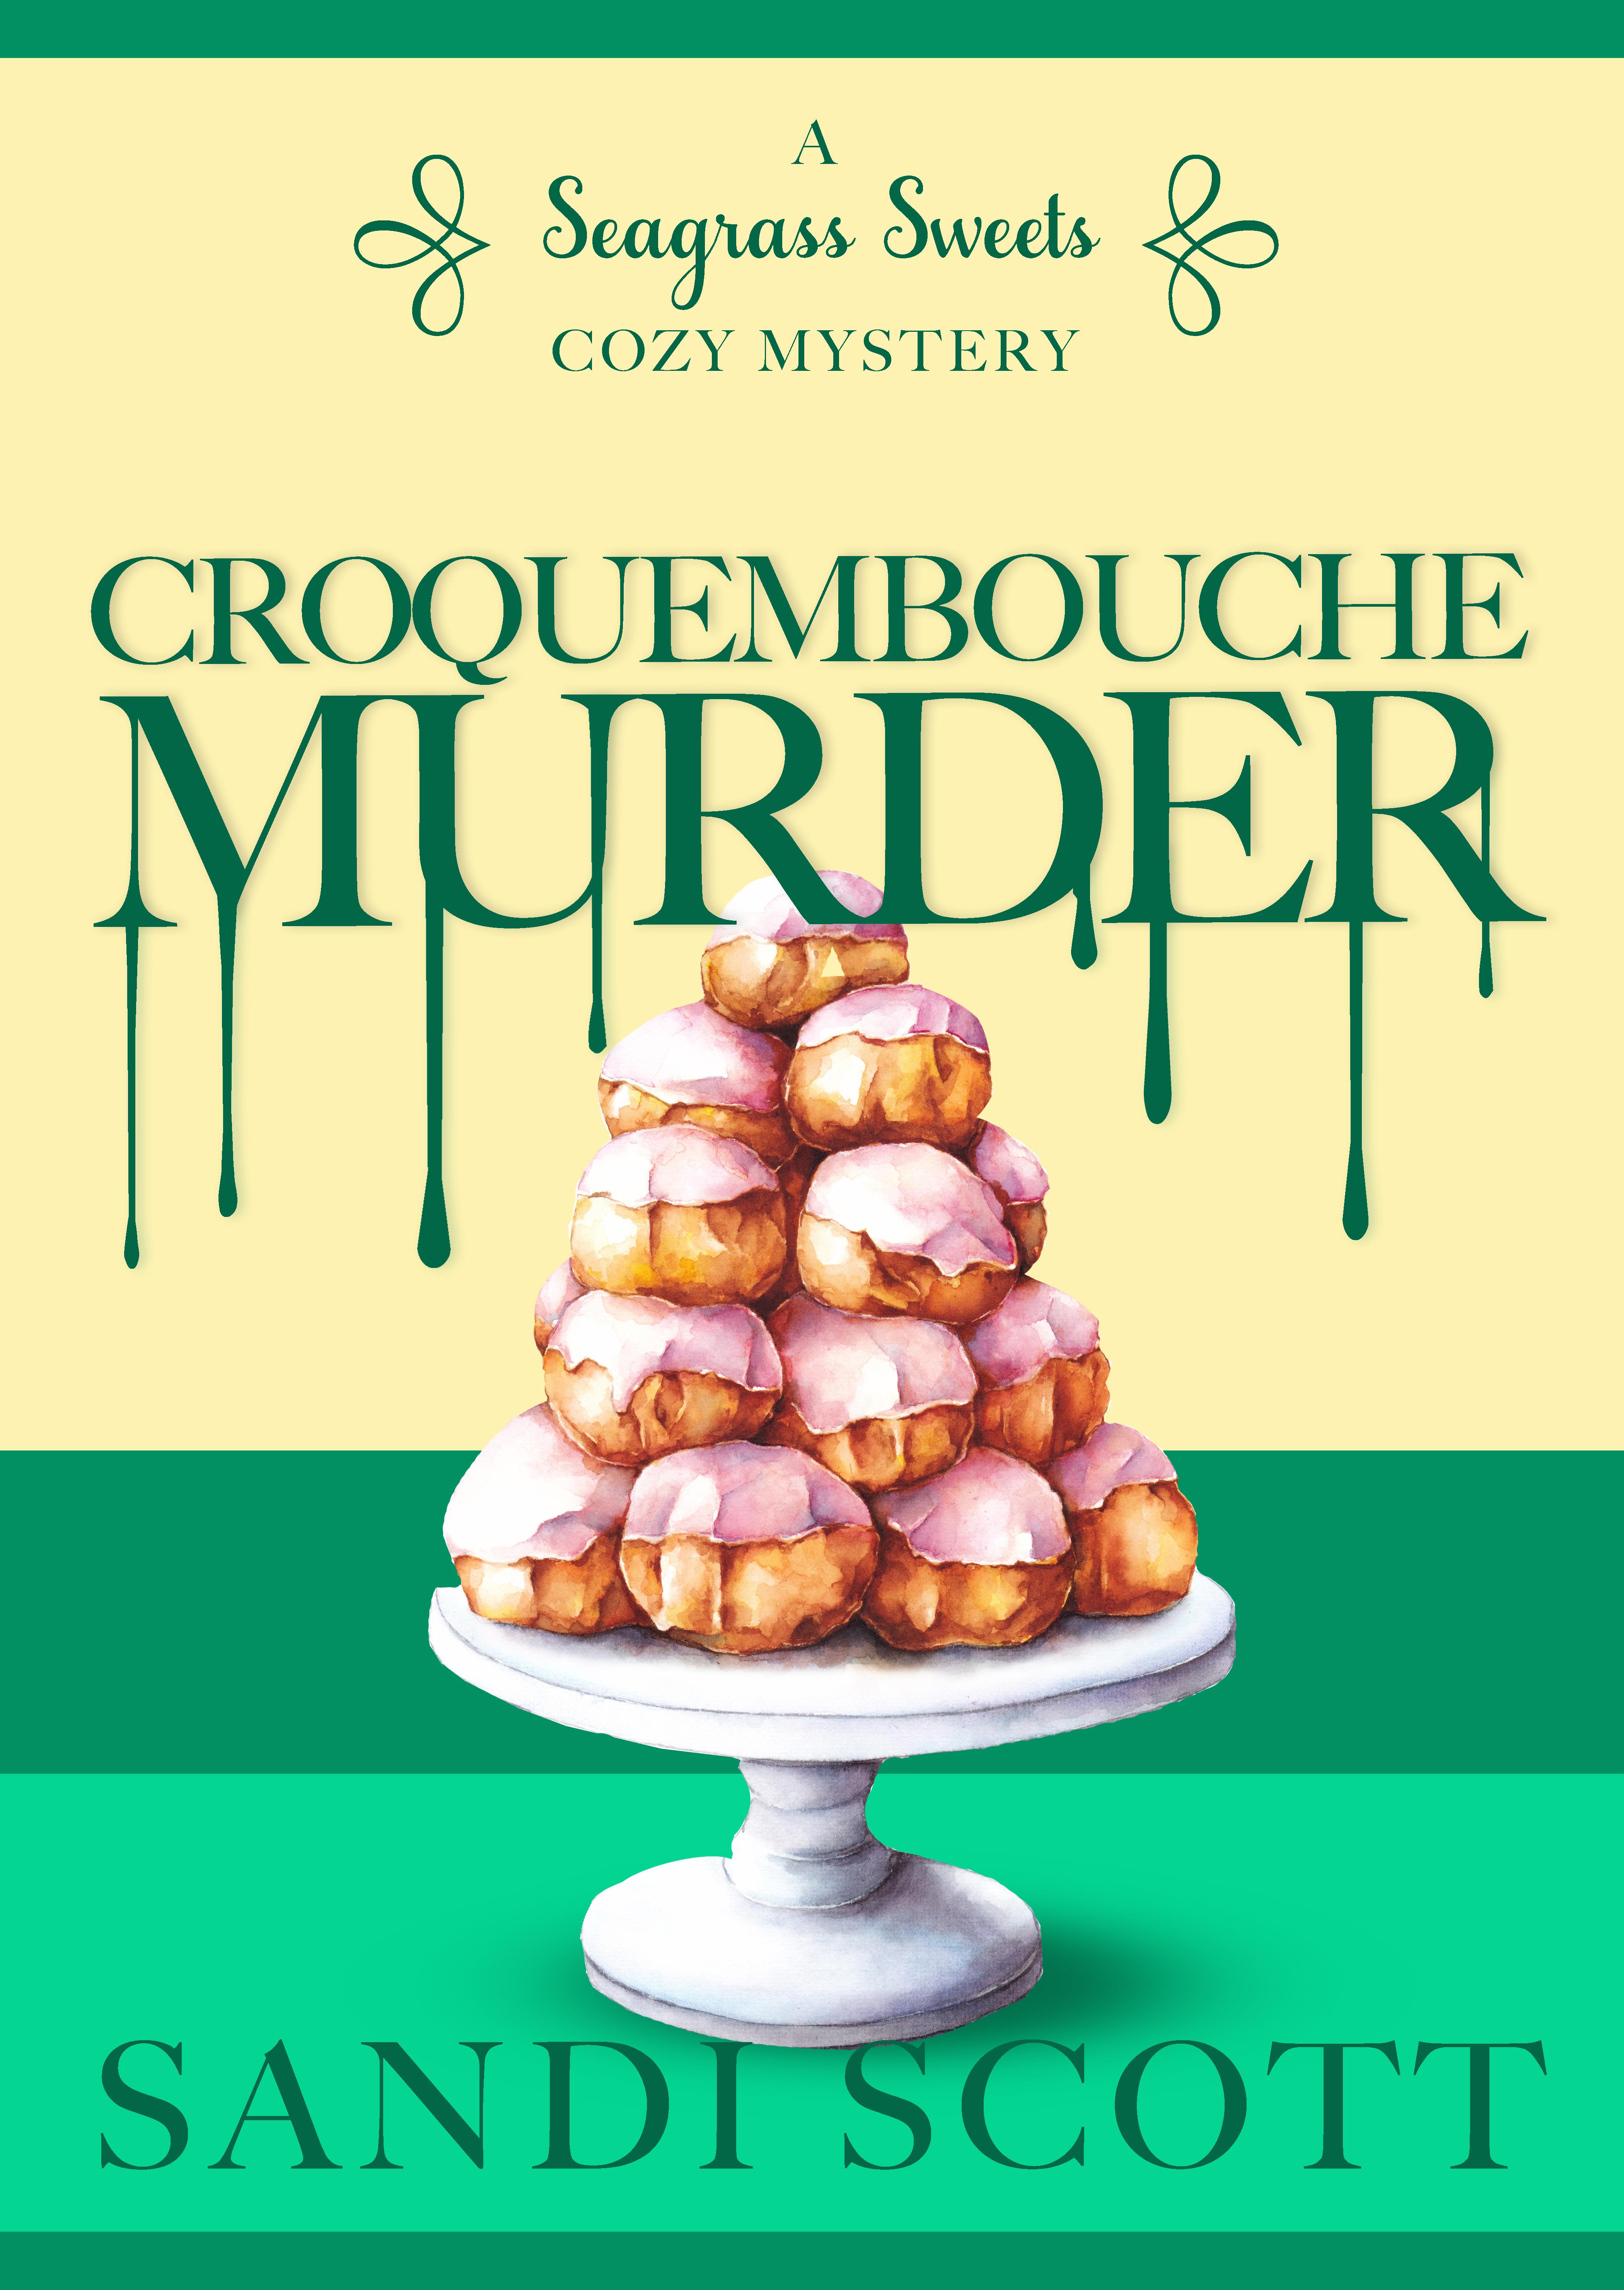 Croqueembouche Cover.jpg